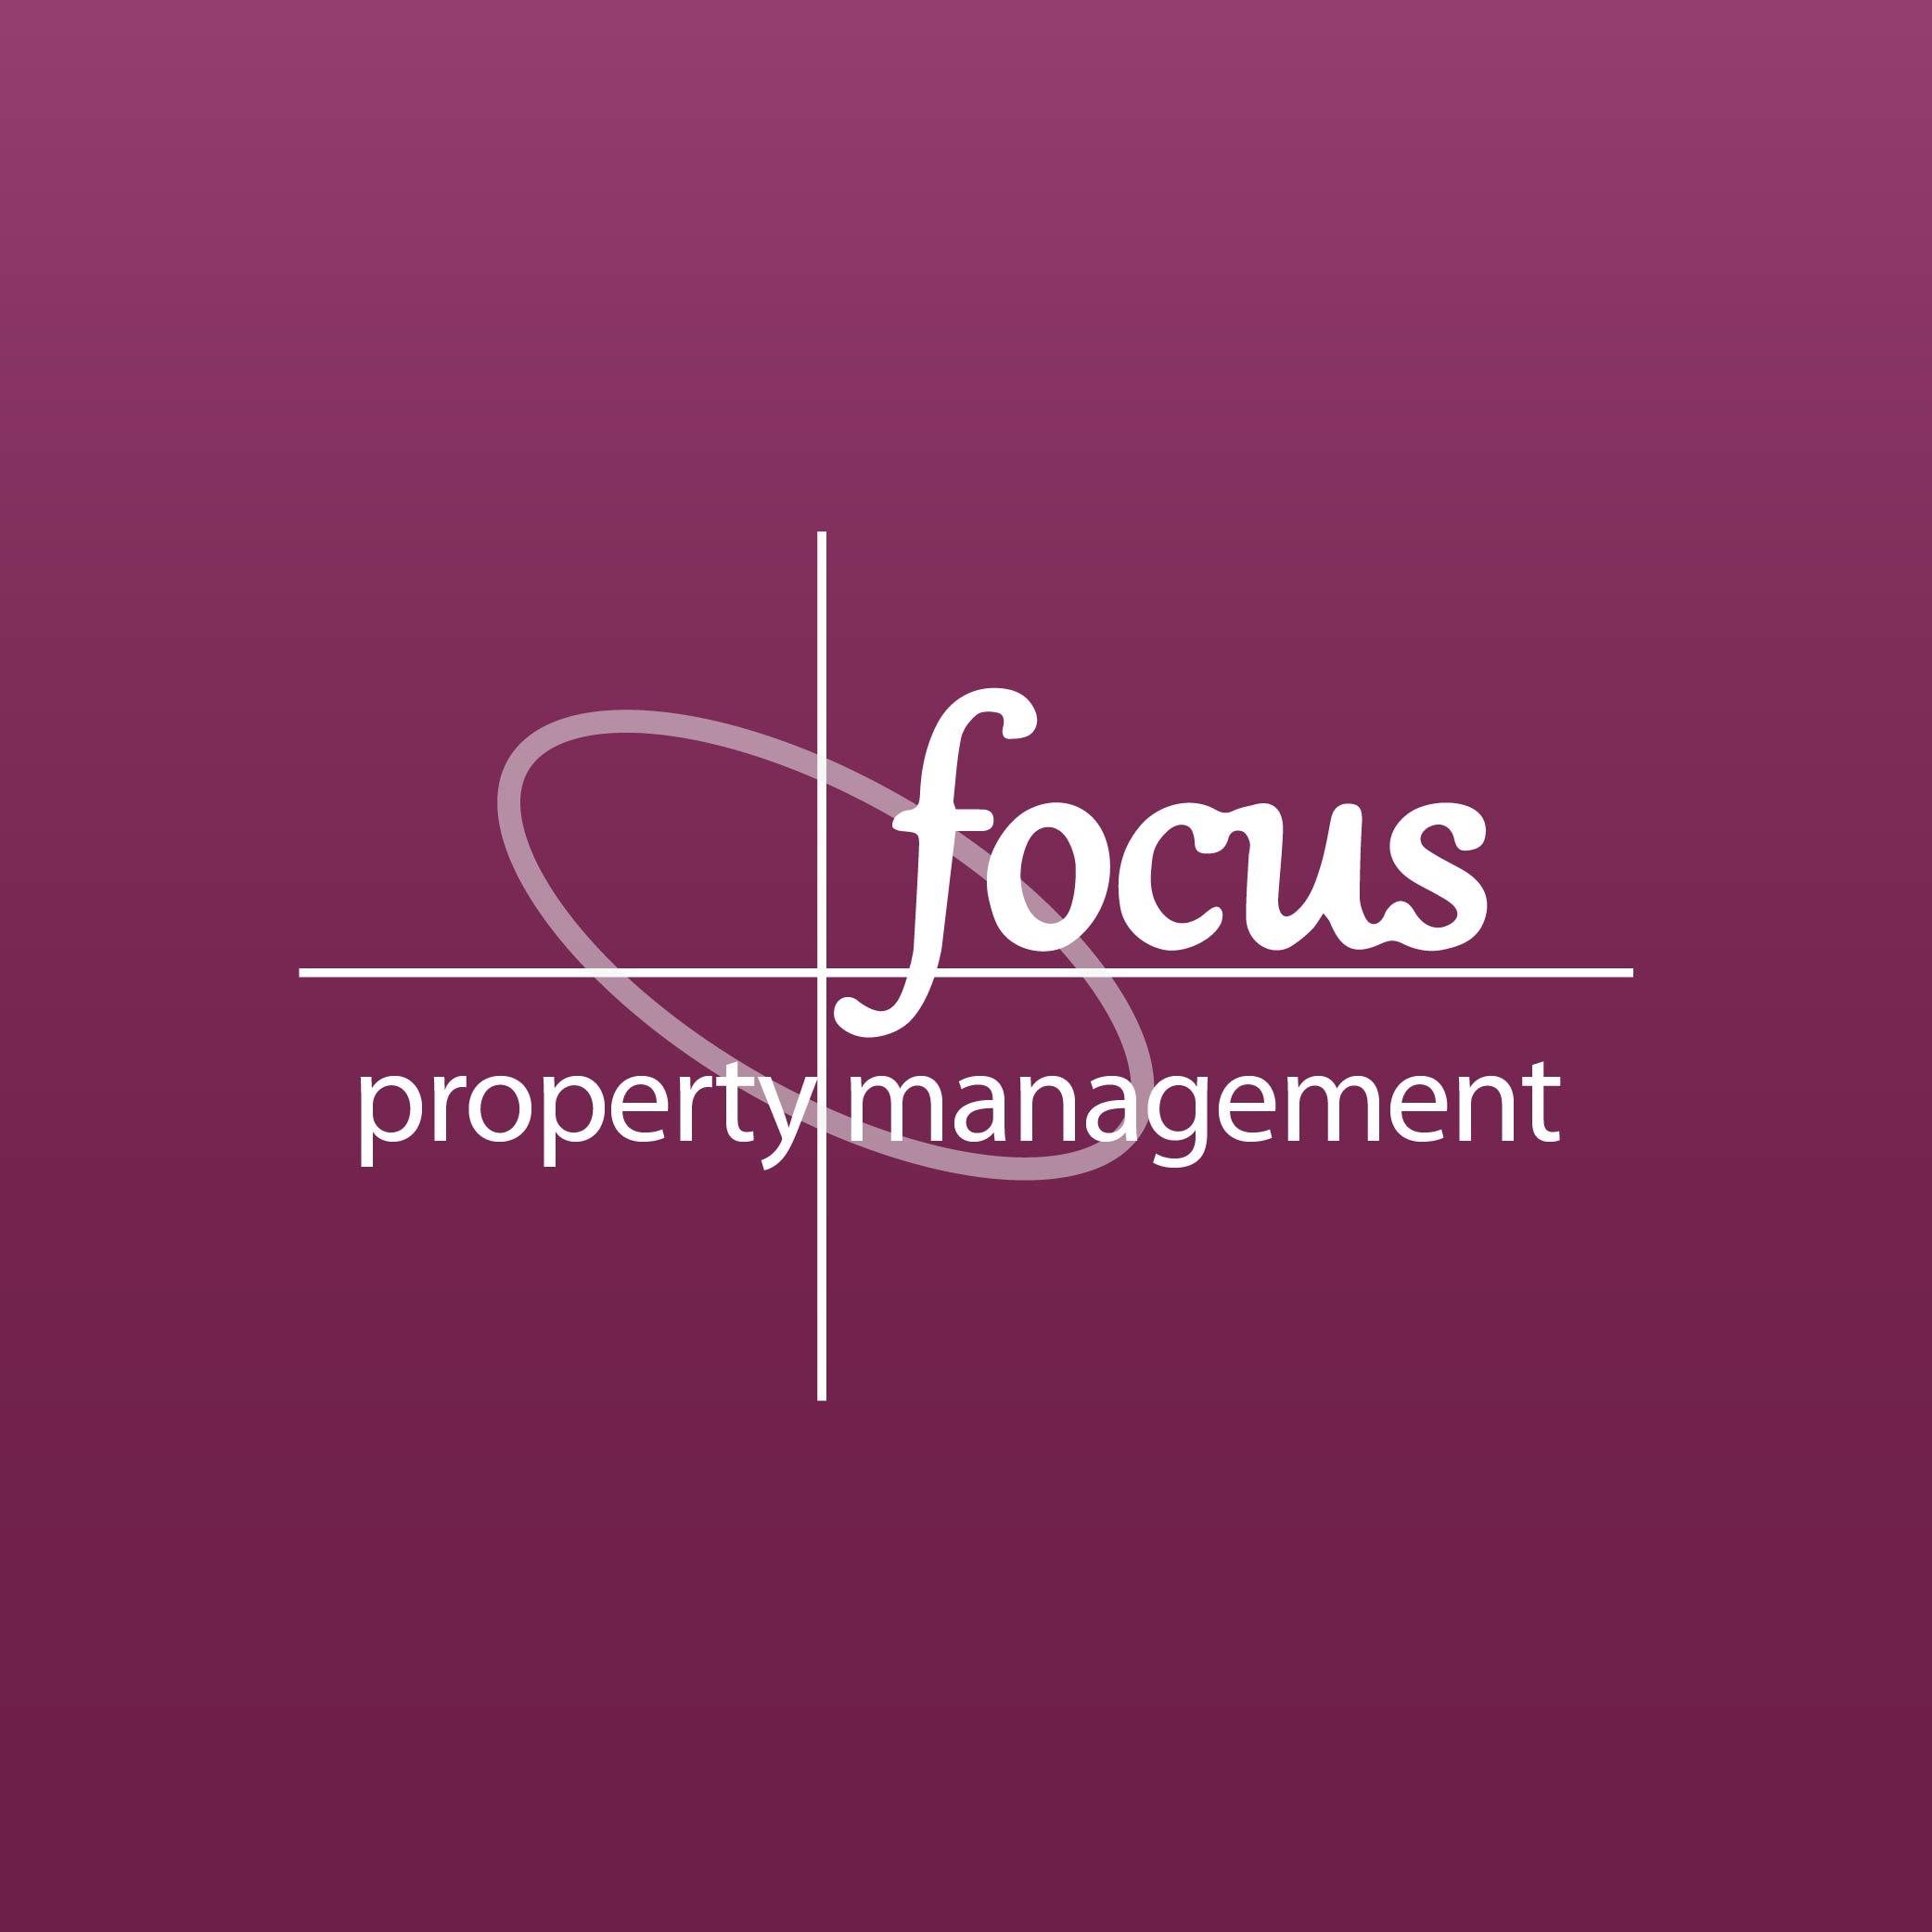 Focus Property Management